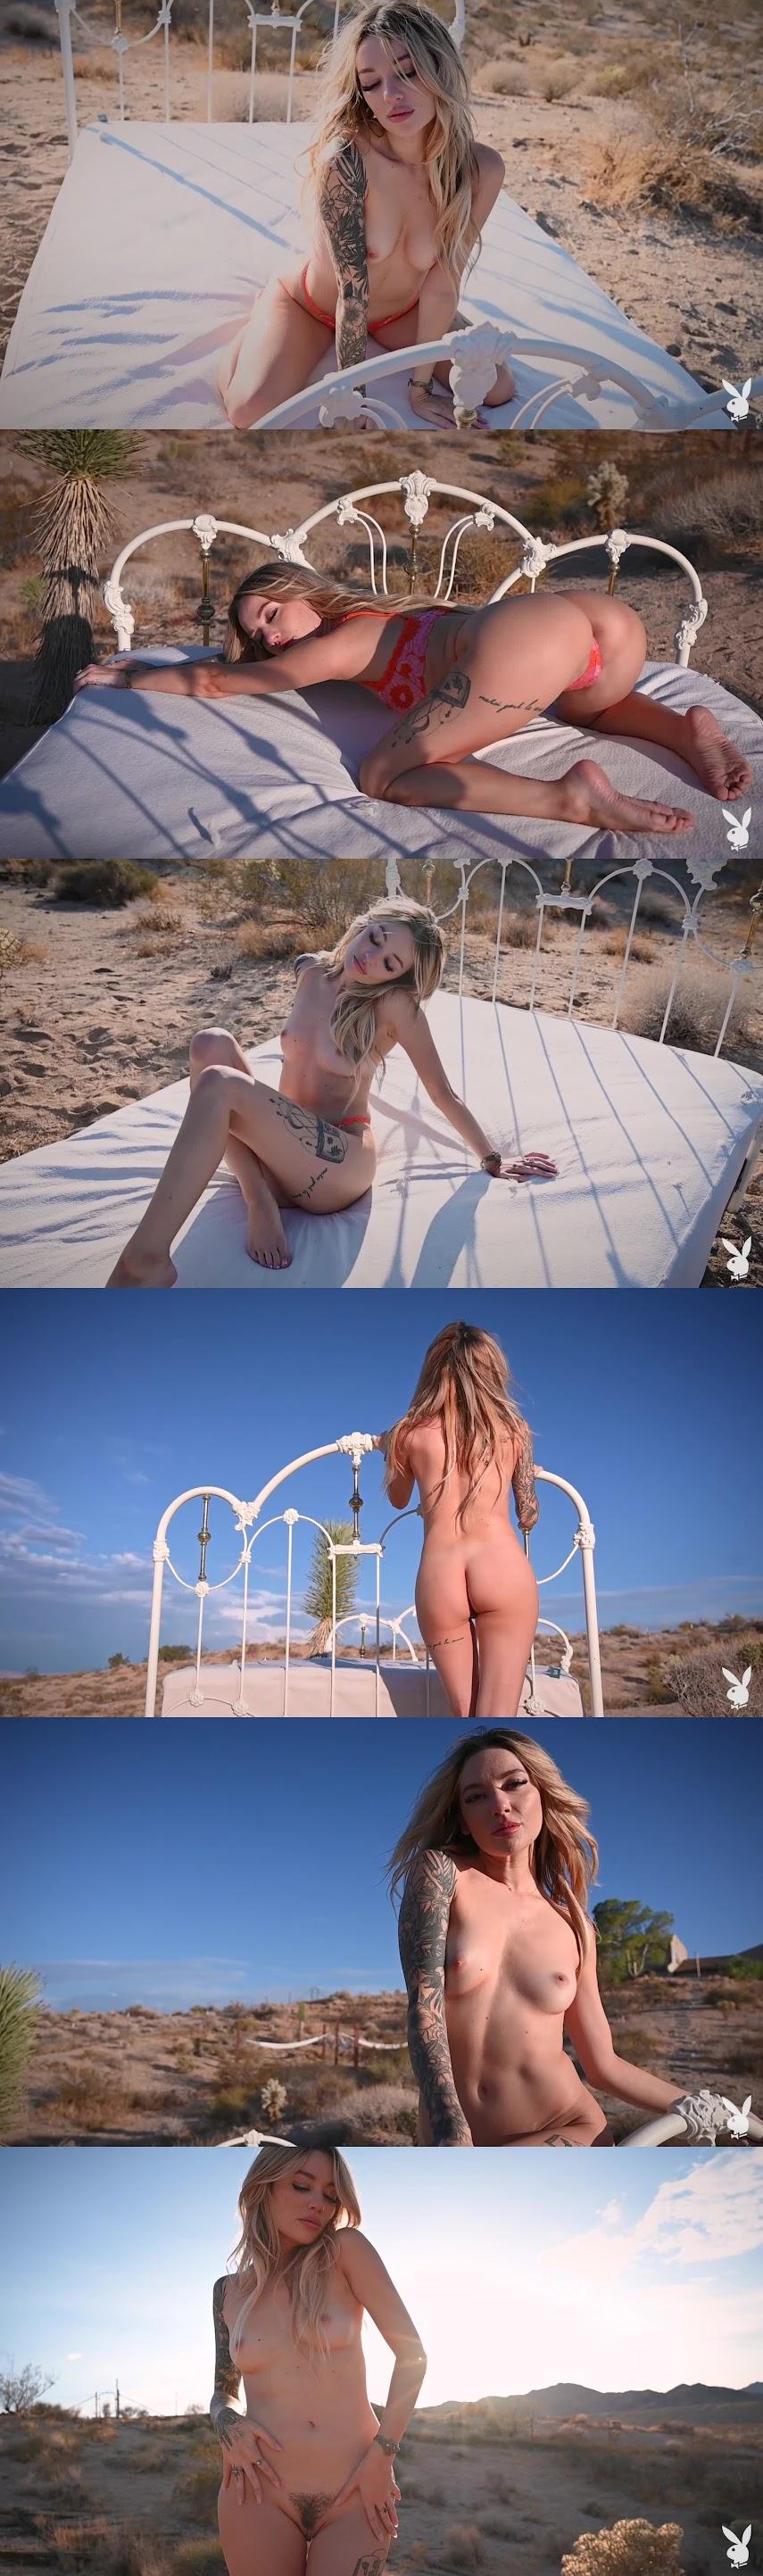 1634310410_junipr41_0027 1-[Playboy Plus] Junipr Keiko in Desert Dream playboy-plus 10190